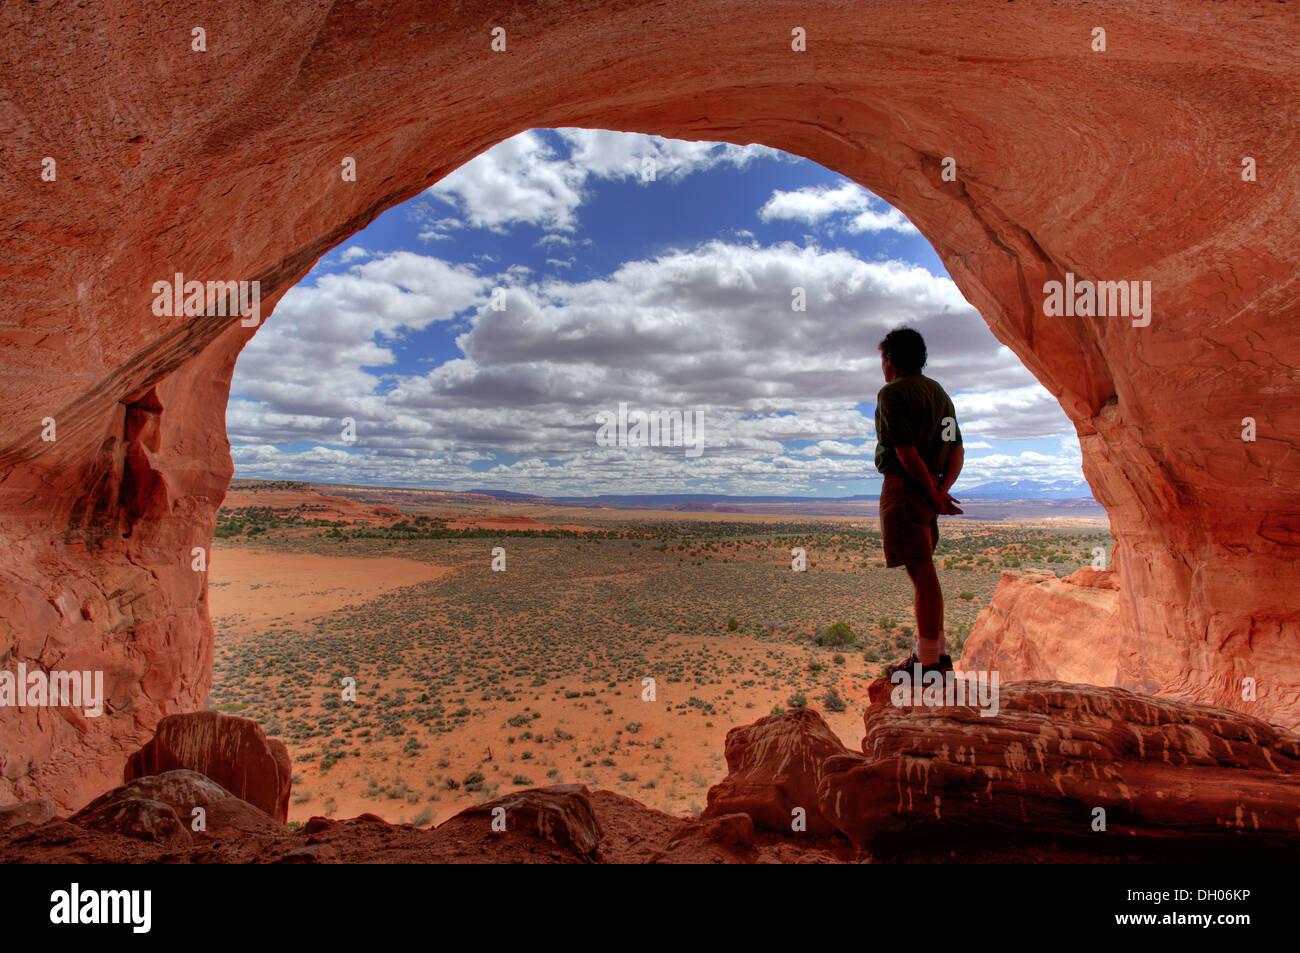 Man enjoys the view at Looking Glass Rock near Moab, Utah, USA - Stock Image